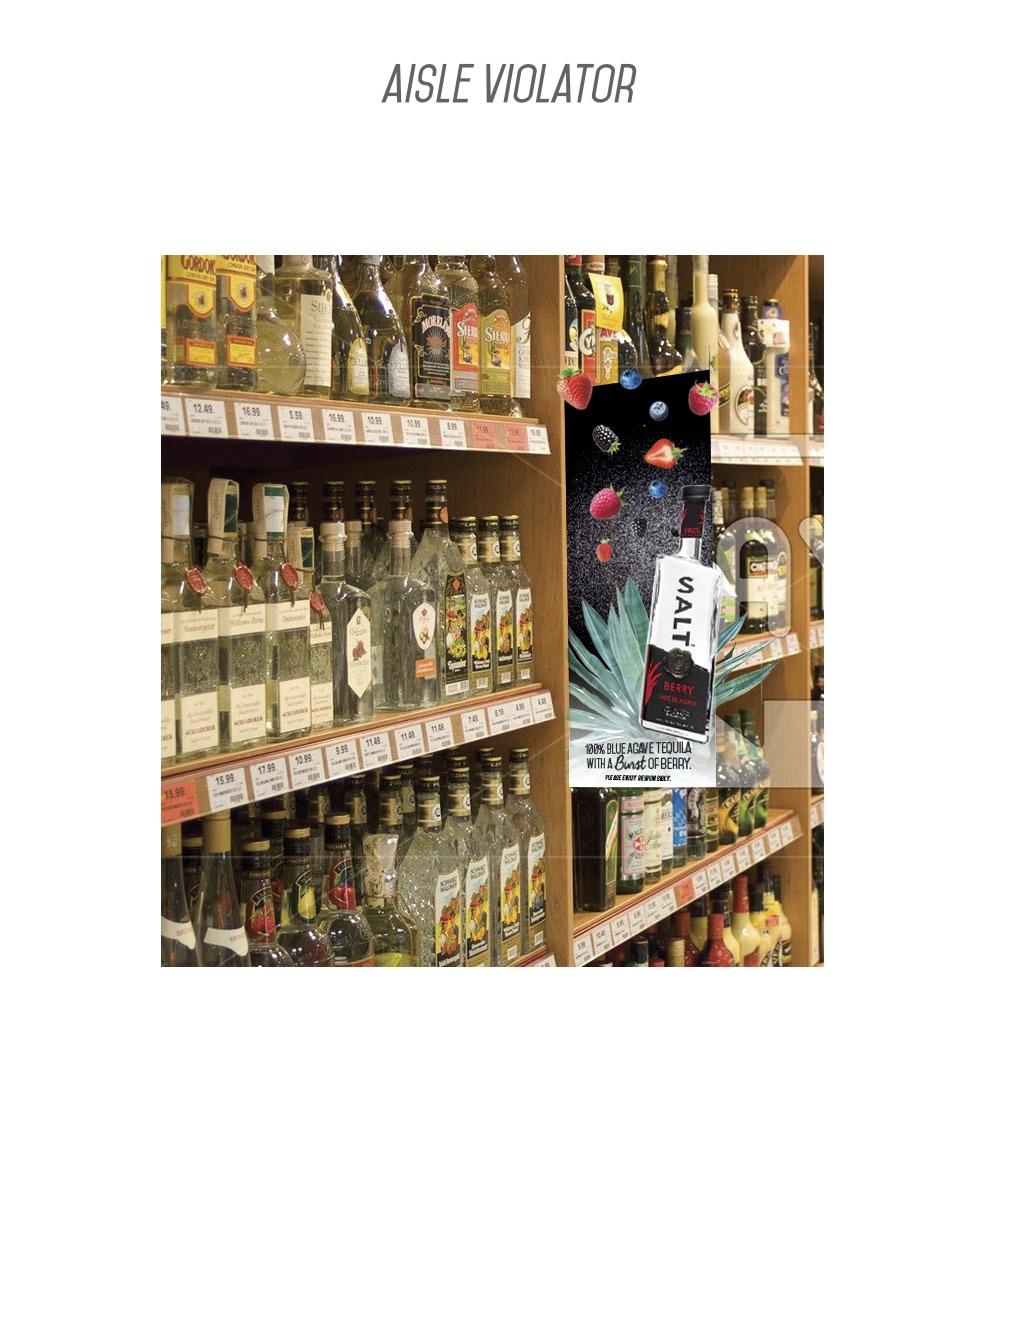 SALT_Tequila_Agave_R3 5.jpg